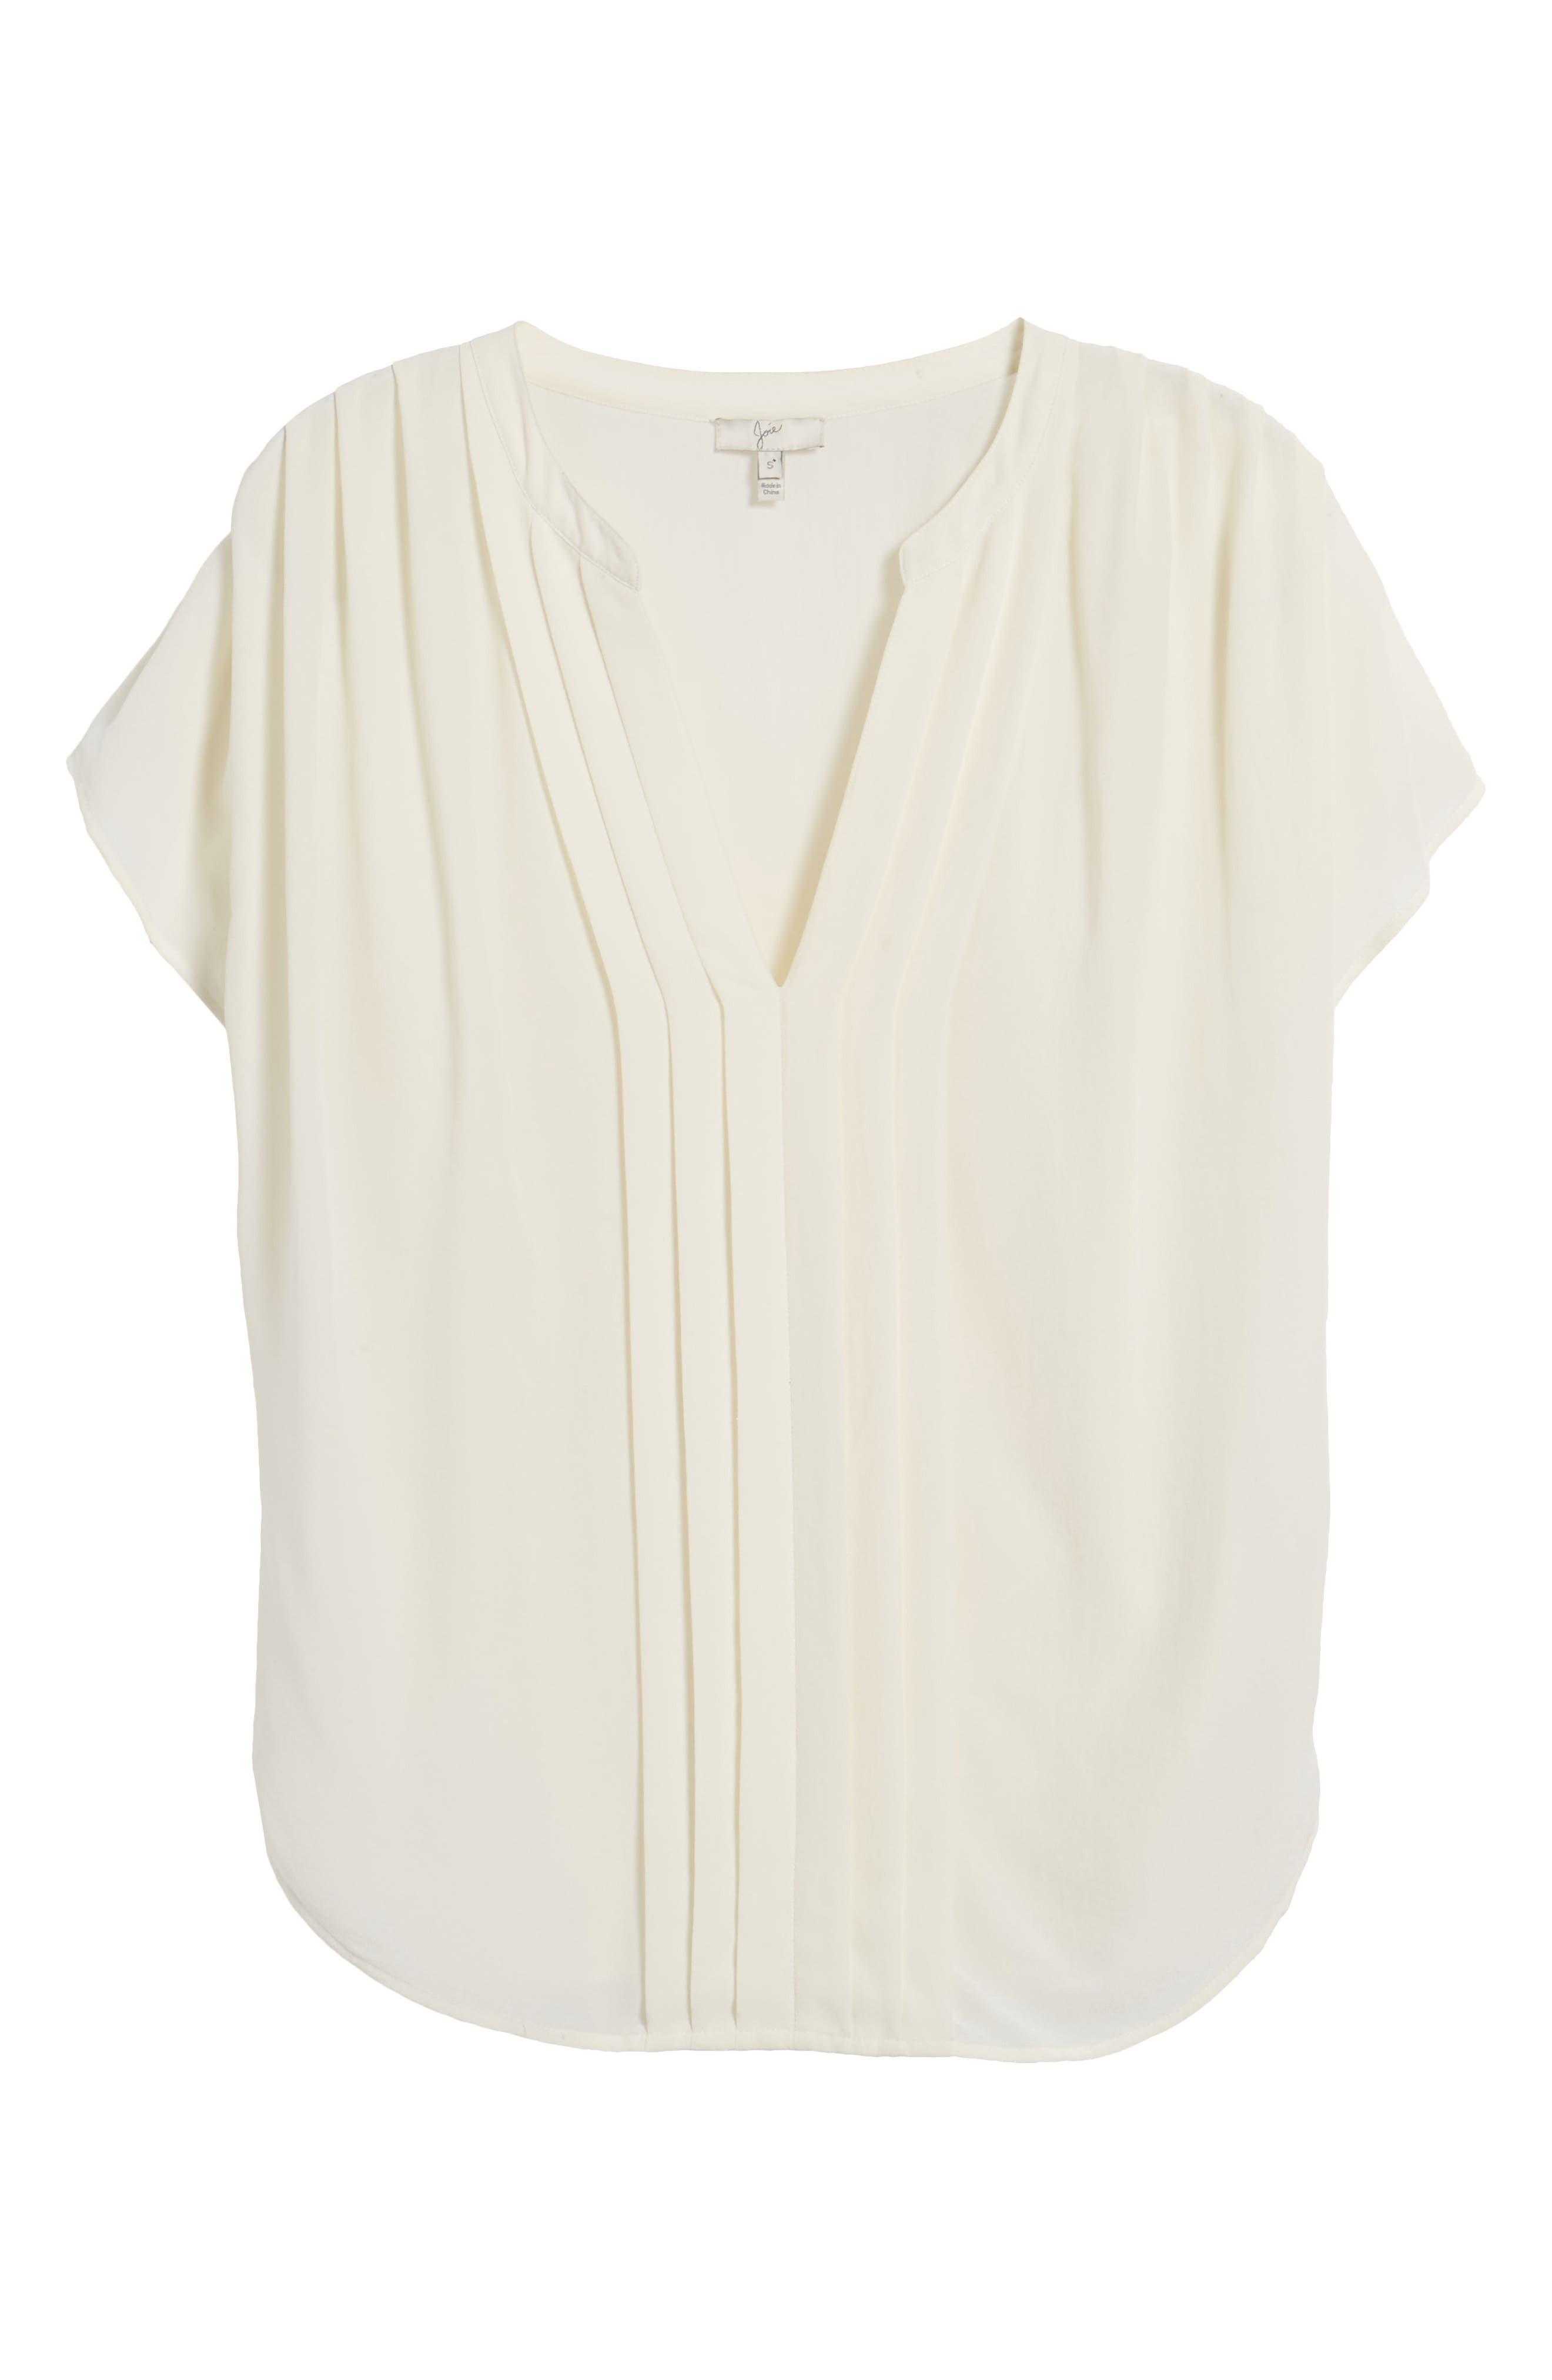 Joie 'Marru' Semi-Sheer Silk Blouse